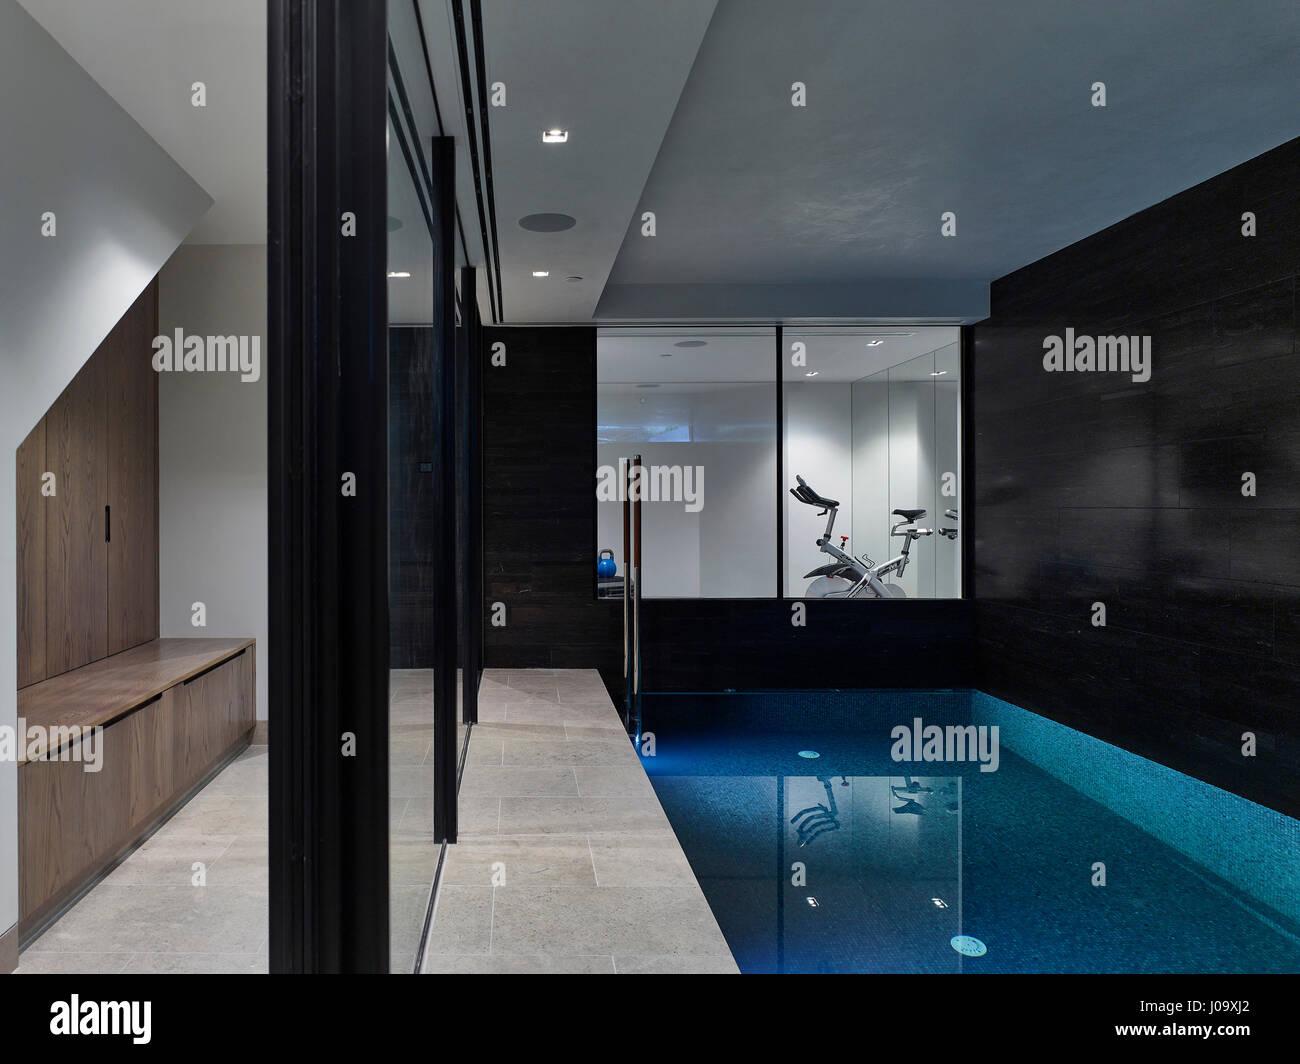 Pool. Hampstead Ponds House, London, United Kingdom. Architect: Stiff + Trevillion Architects, 2016. - Stock Image